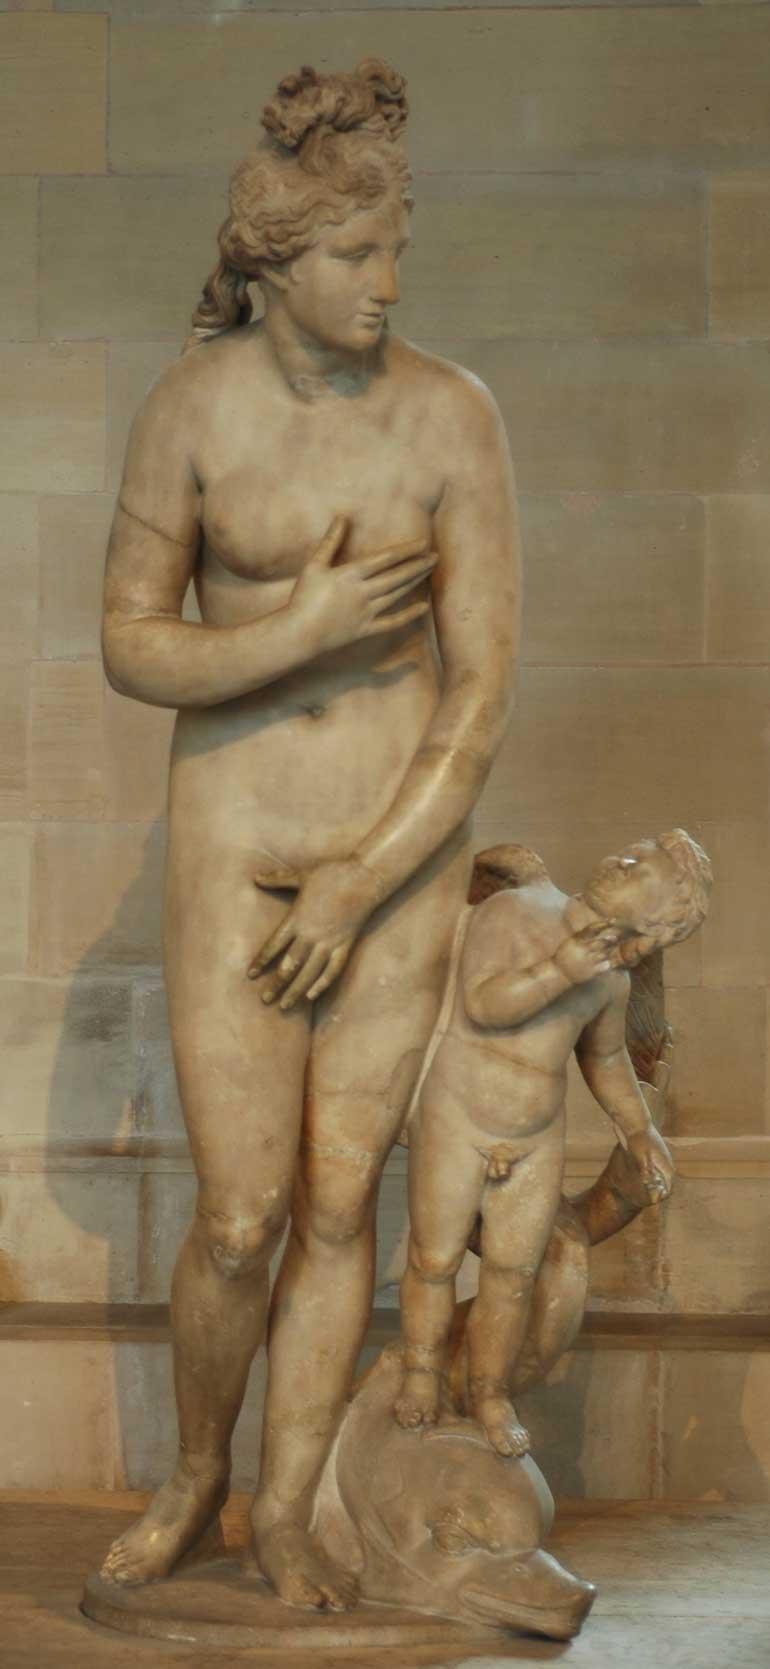 http://www.mlahanas.de/Greeks/Mythology/Images/CapitolineVenusMa335.jpg